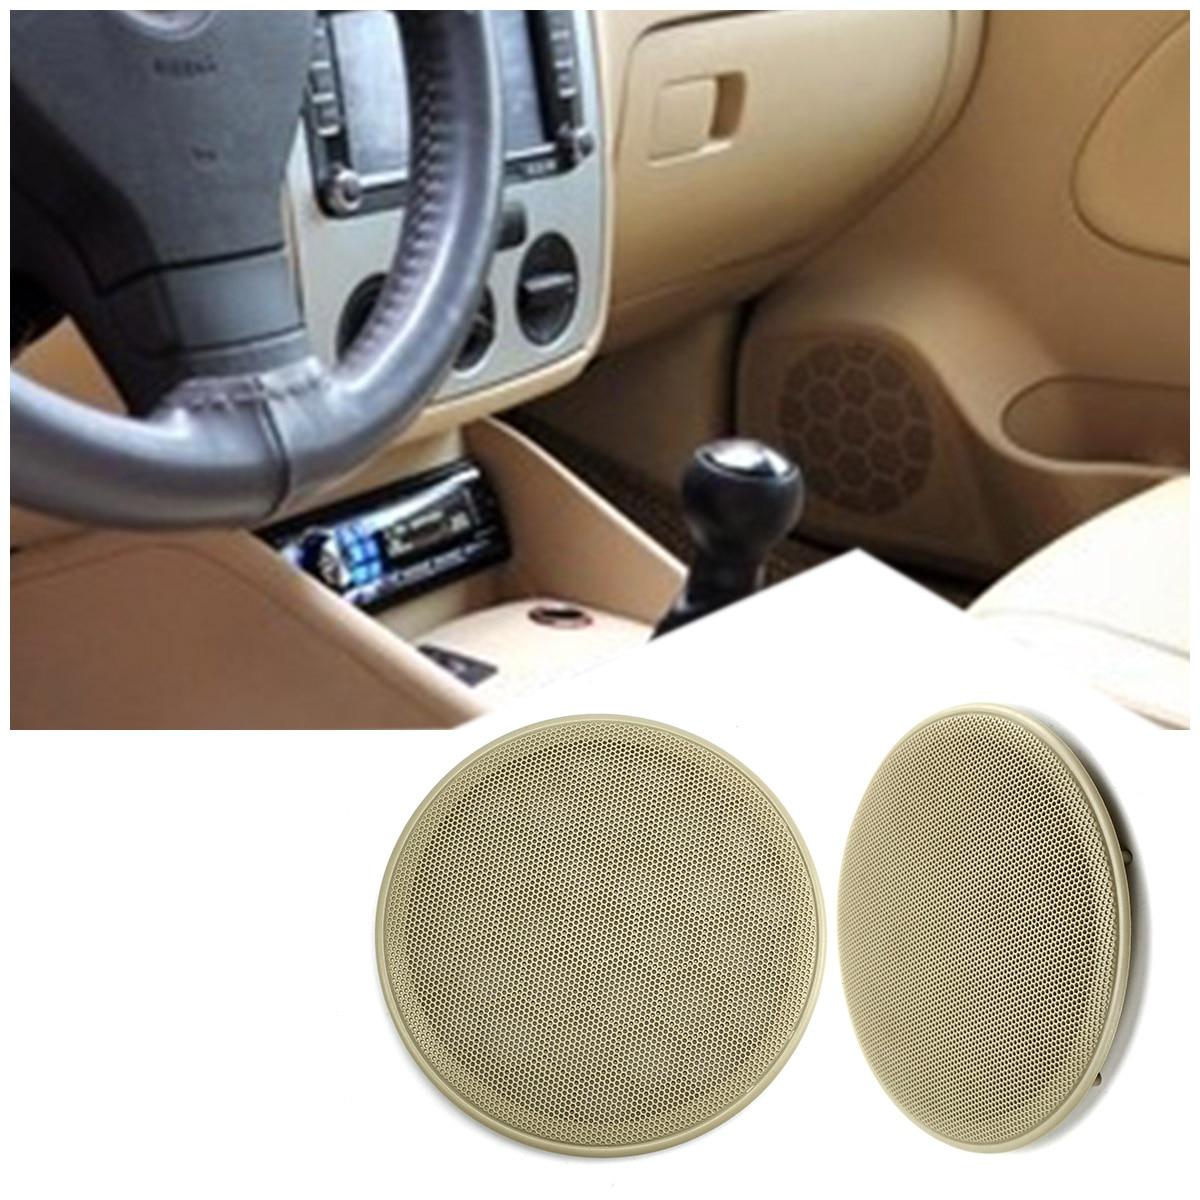 beige pair door speaker loud speaker cover grill for vw jetta golf mk4 passat b5 on aliexpress. Black Bedroom Furniture Sets. Home Design Ideas